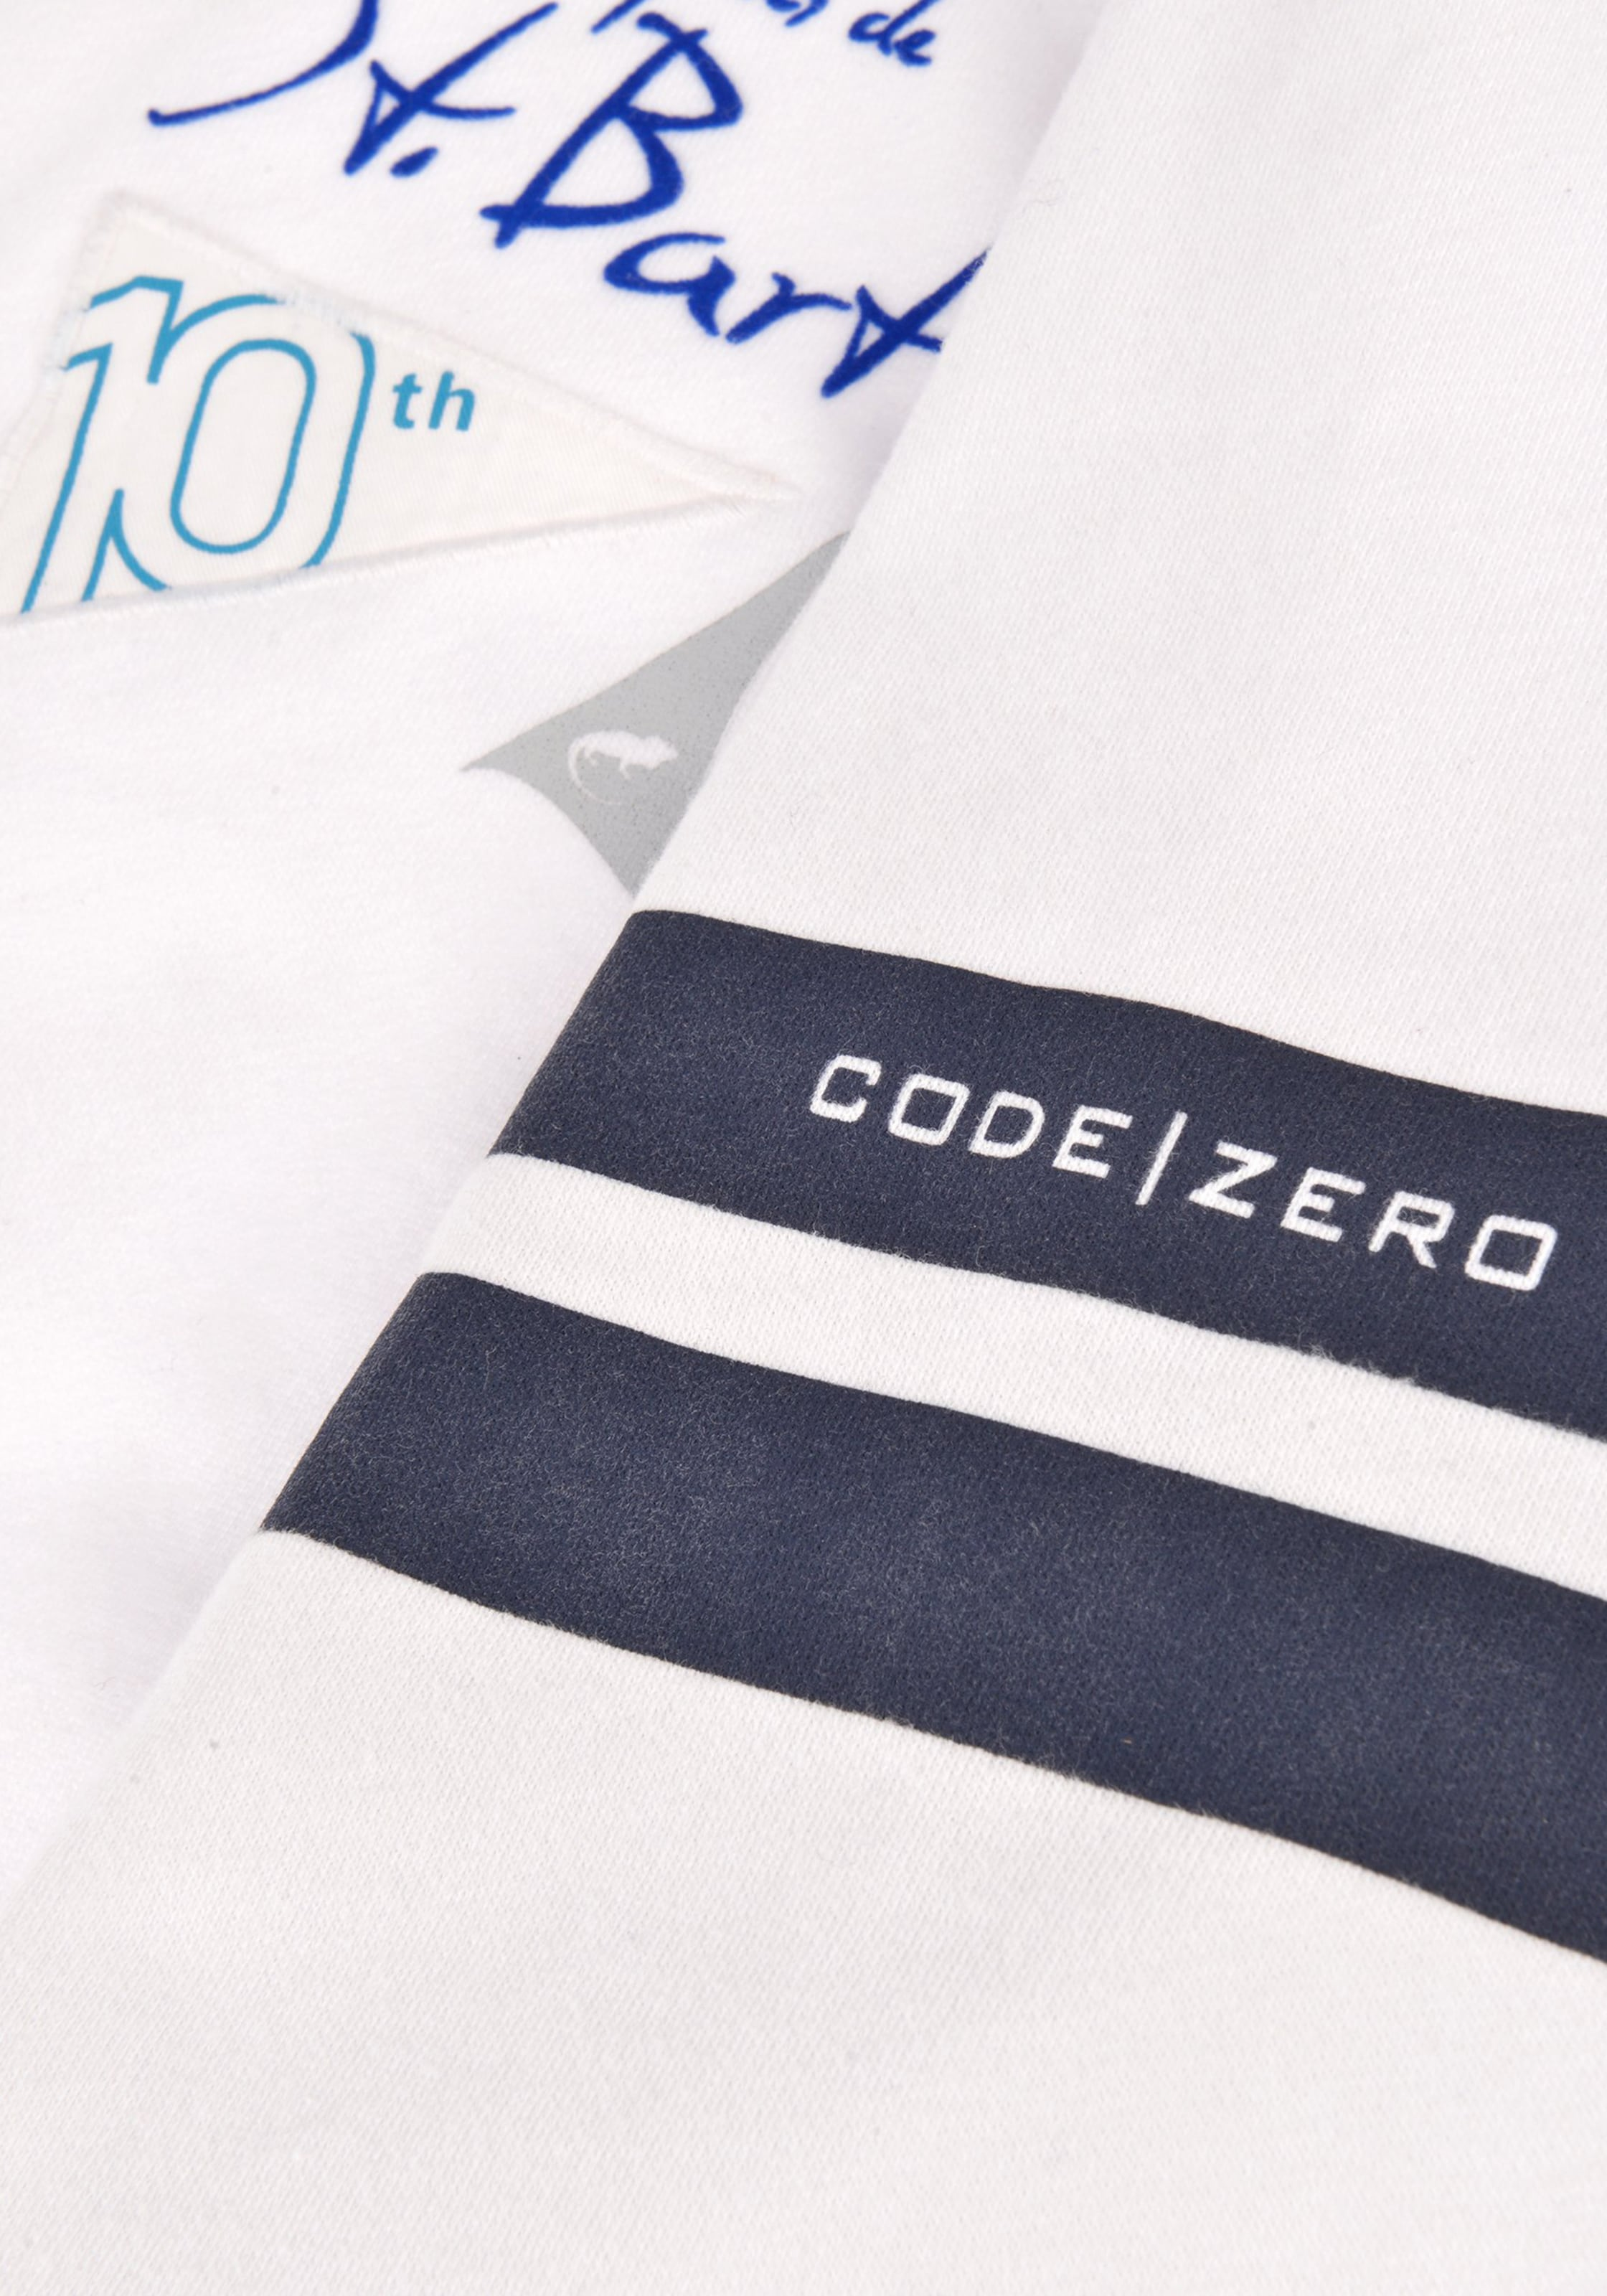 zero In UltramarinblauWeiß Code 'french Sweatjacke Caribean' tshQrdC